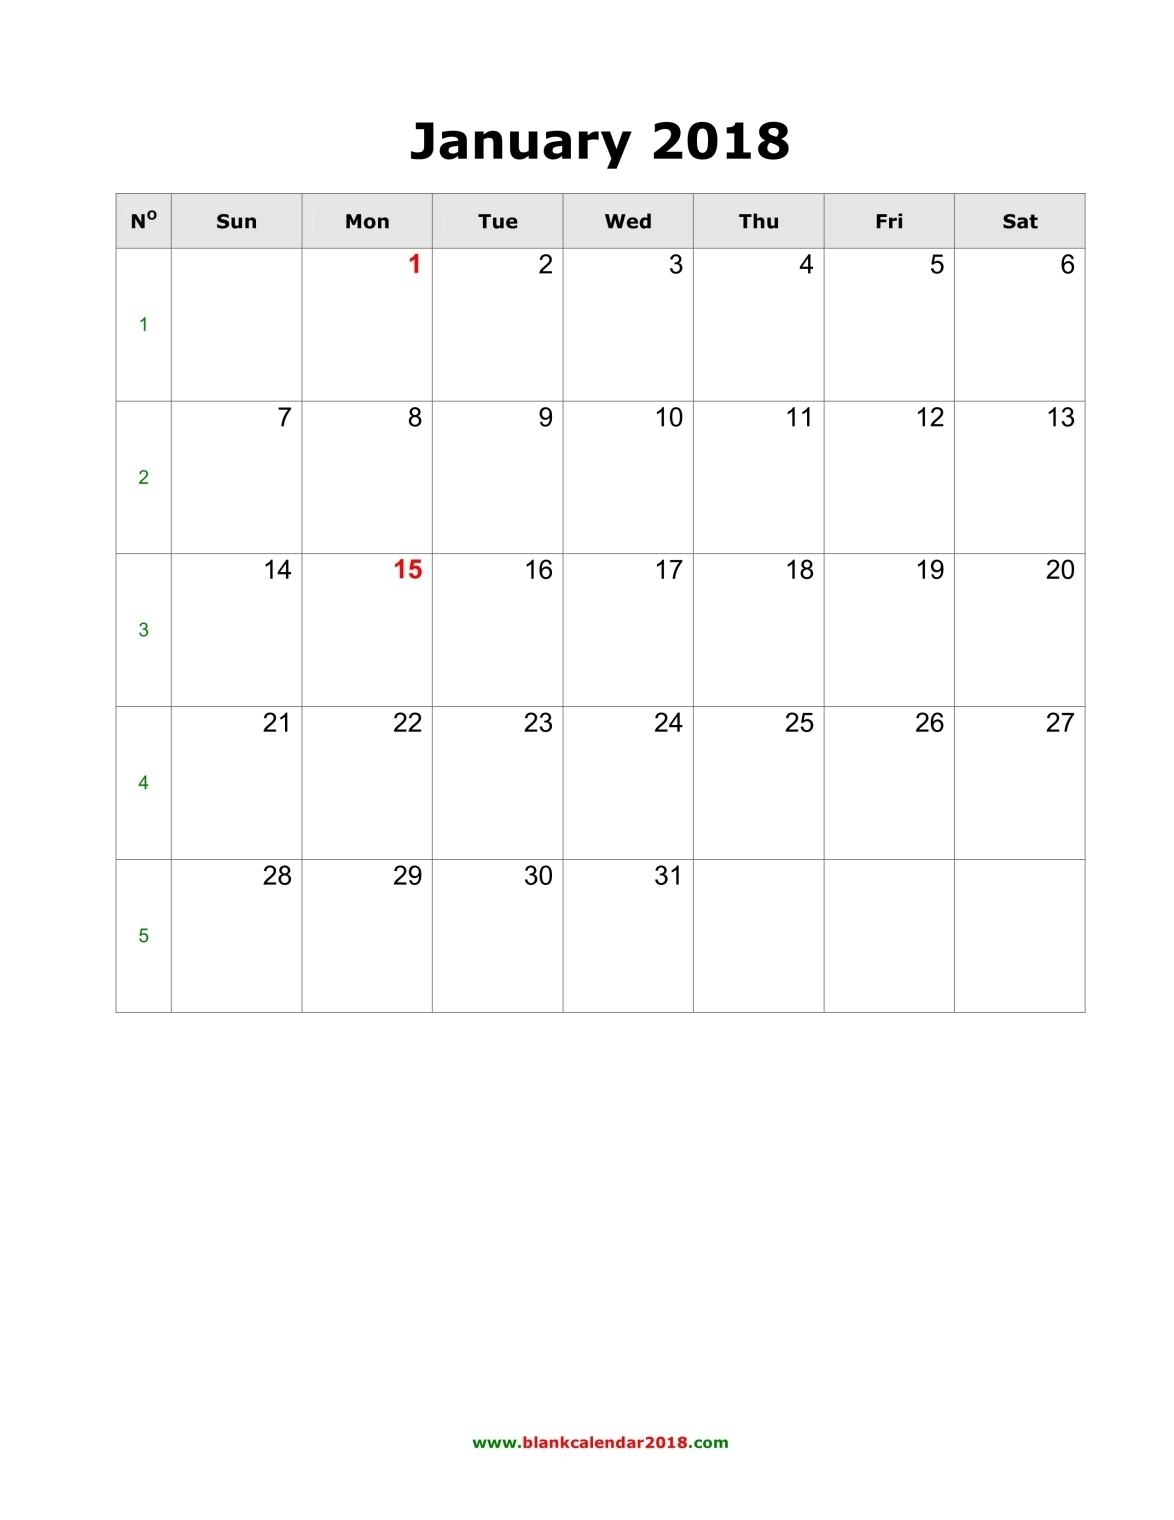 weekly calendar january 2018